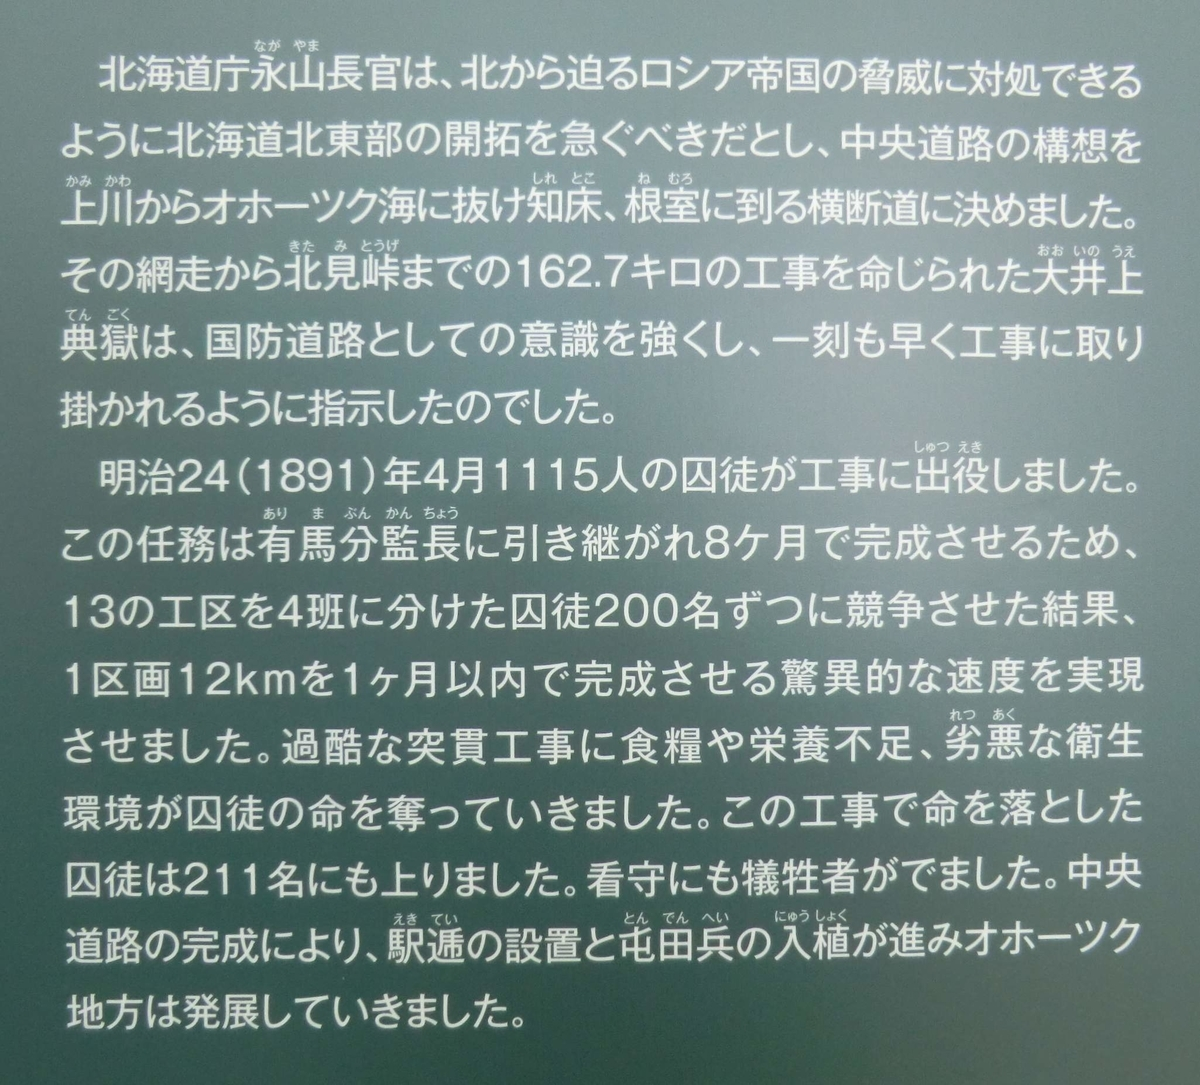 f:id:ryuuzanshi:20200229112817j:plain